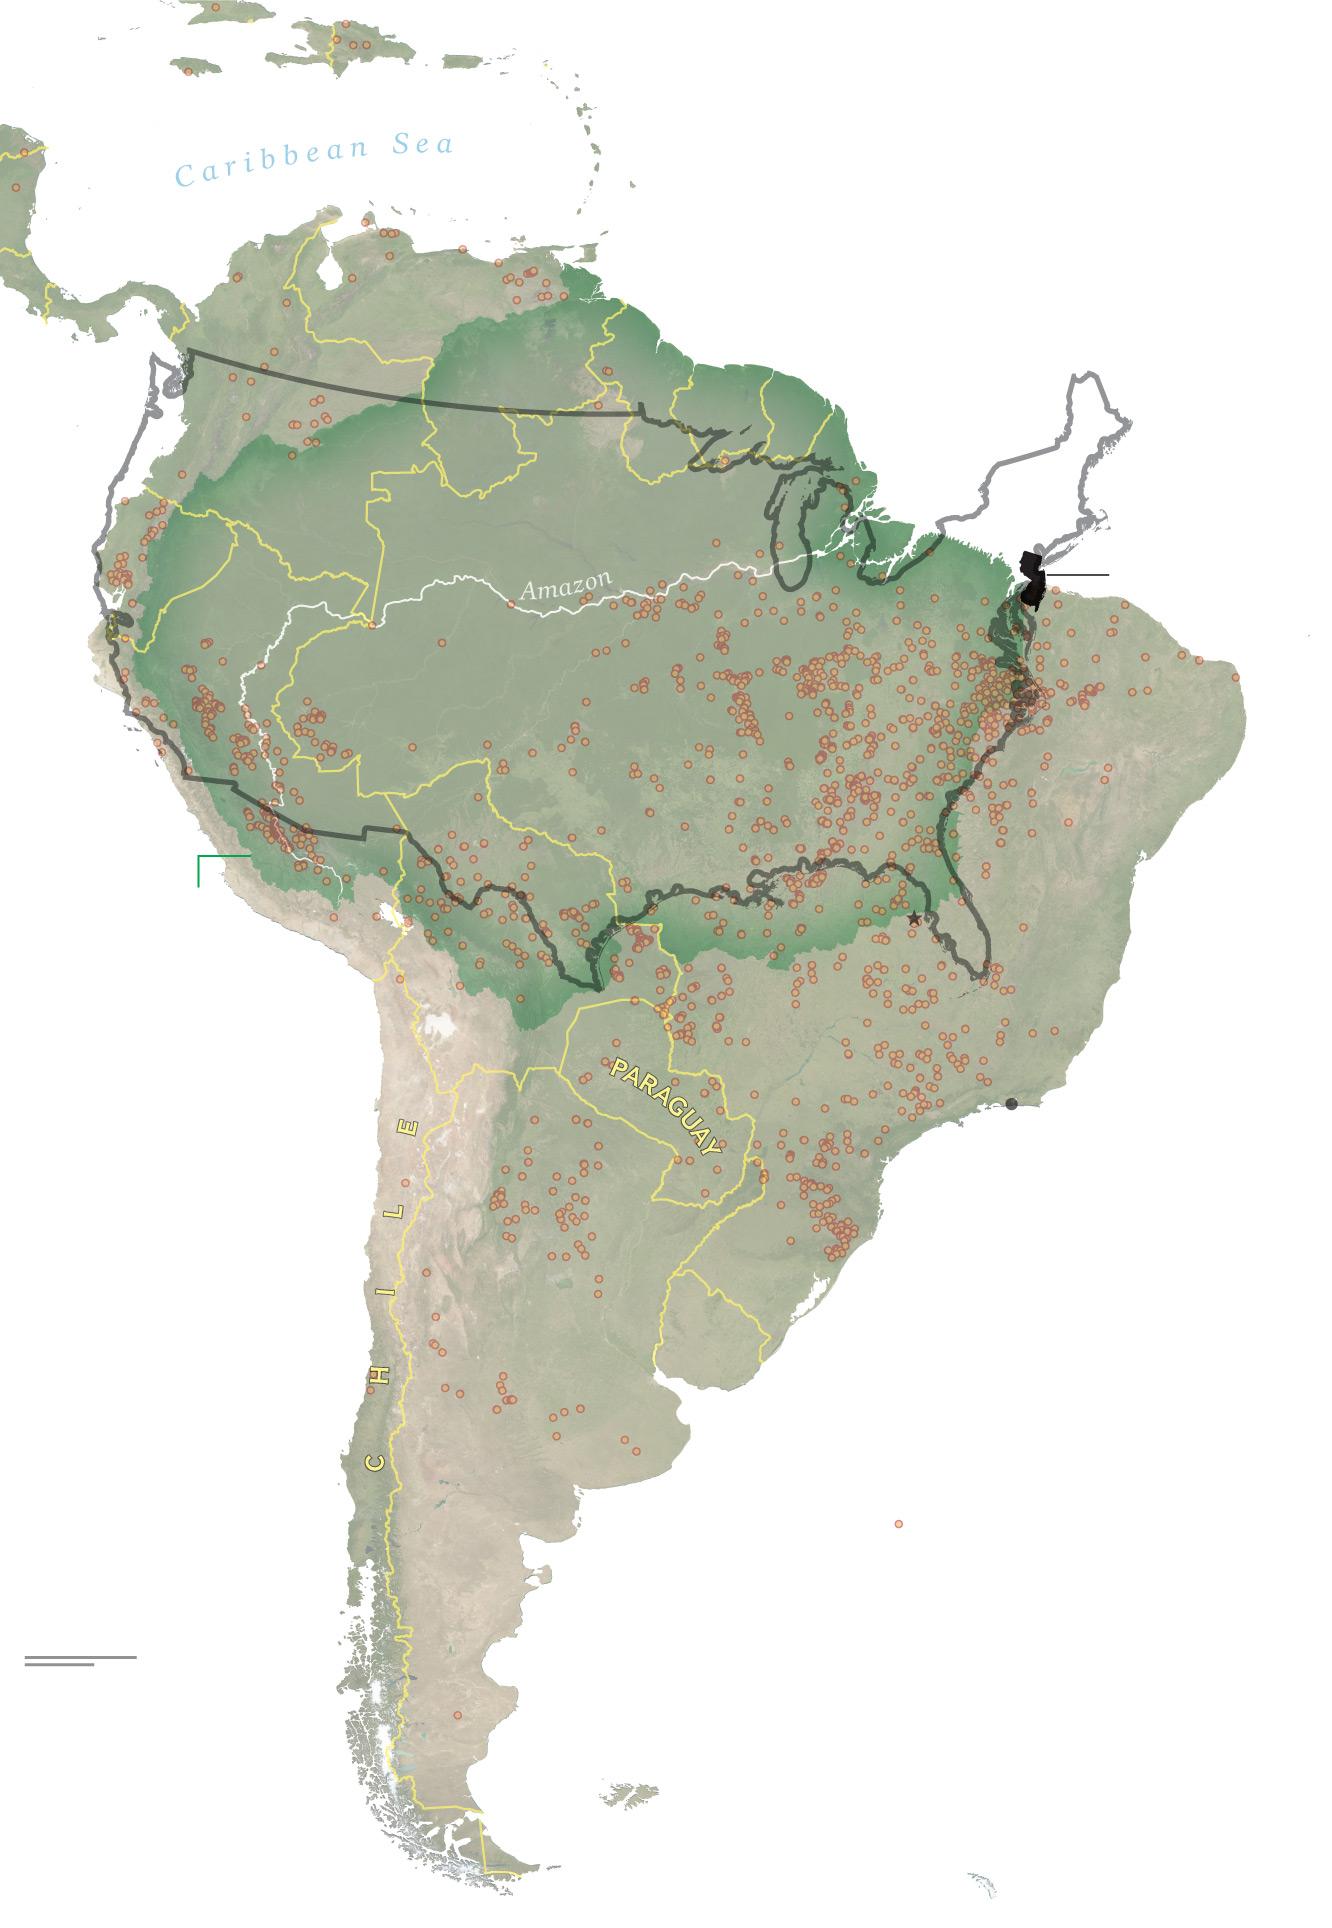 Amazon Rainforest World Map : amazon, rainforest, world, Amazon, Forest, Burning,, Compares, Other, Years